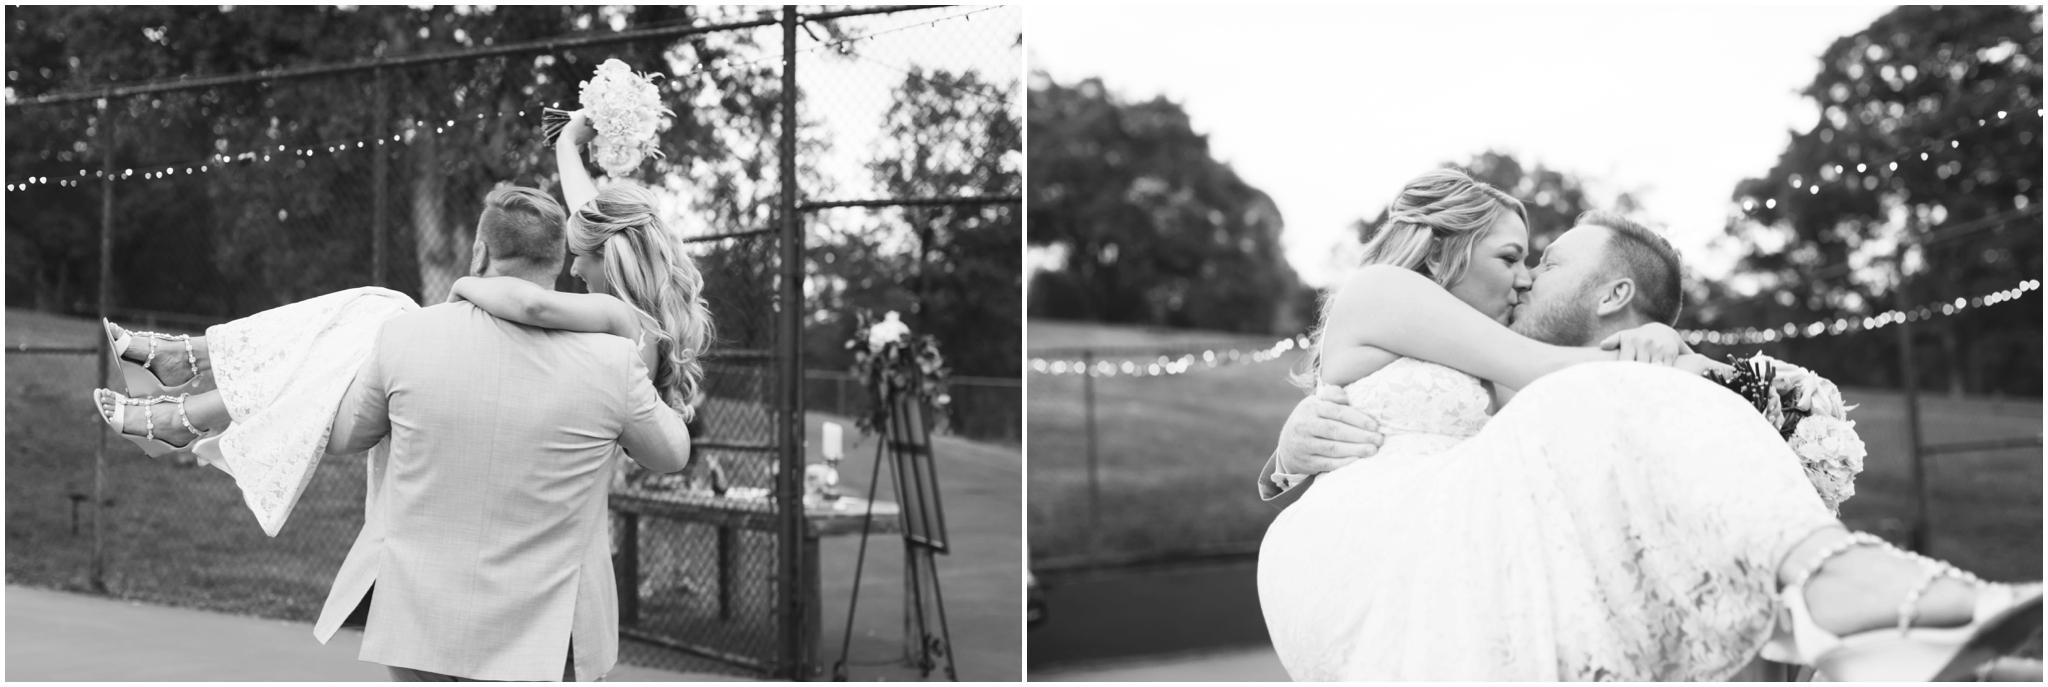 cindy_joseph_wedding_redding_blog_0032.jpg